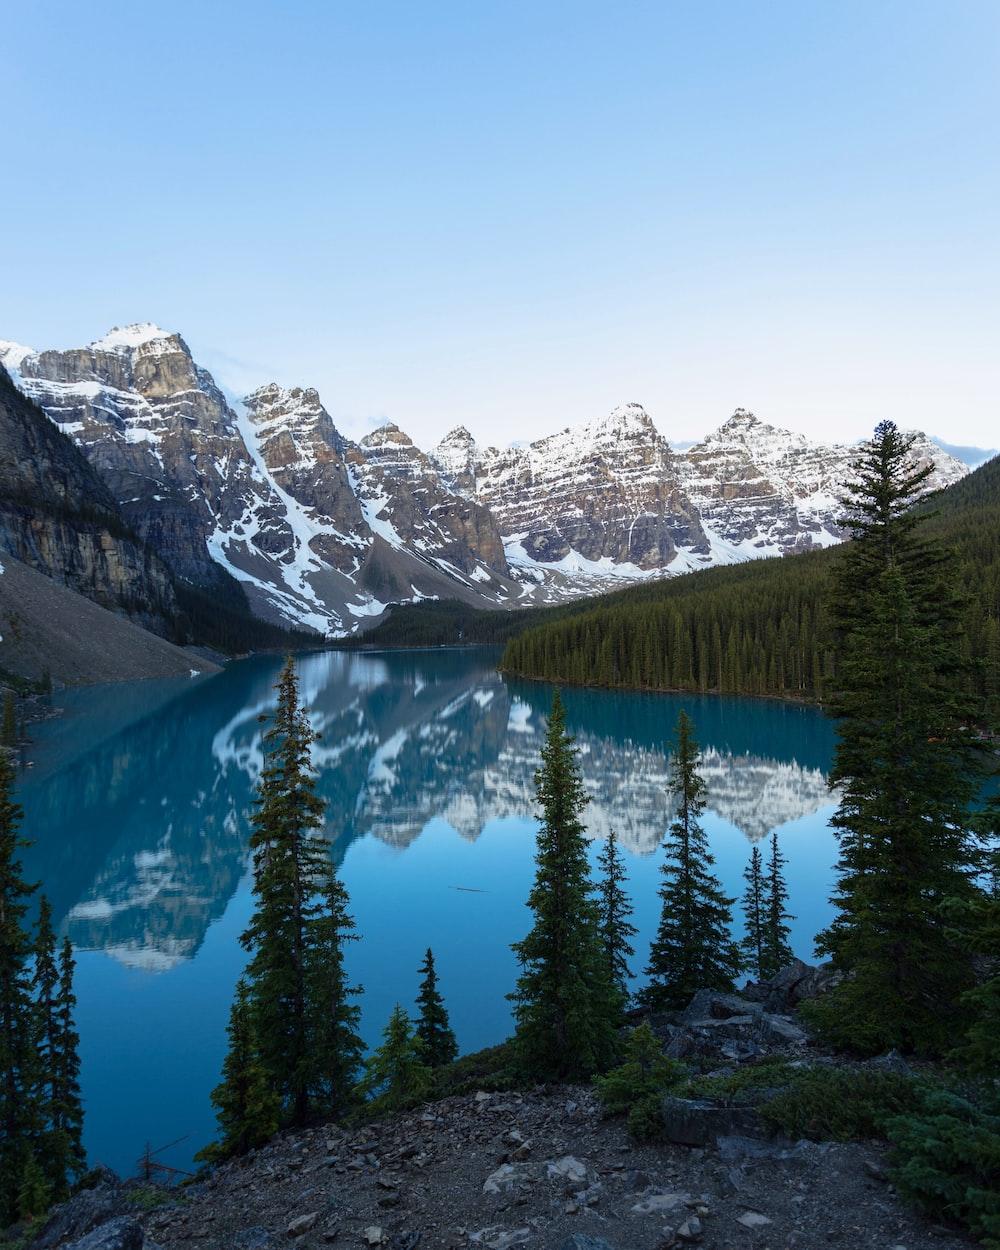 pine trees near lake and mountains